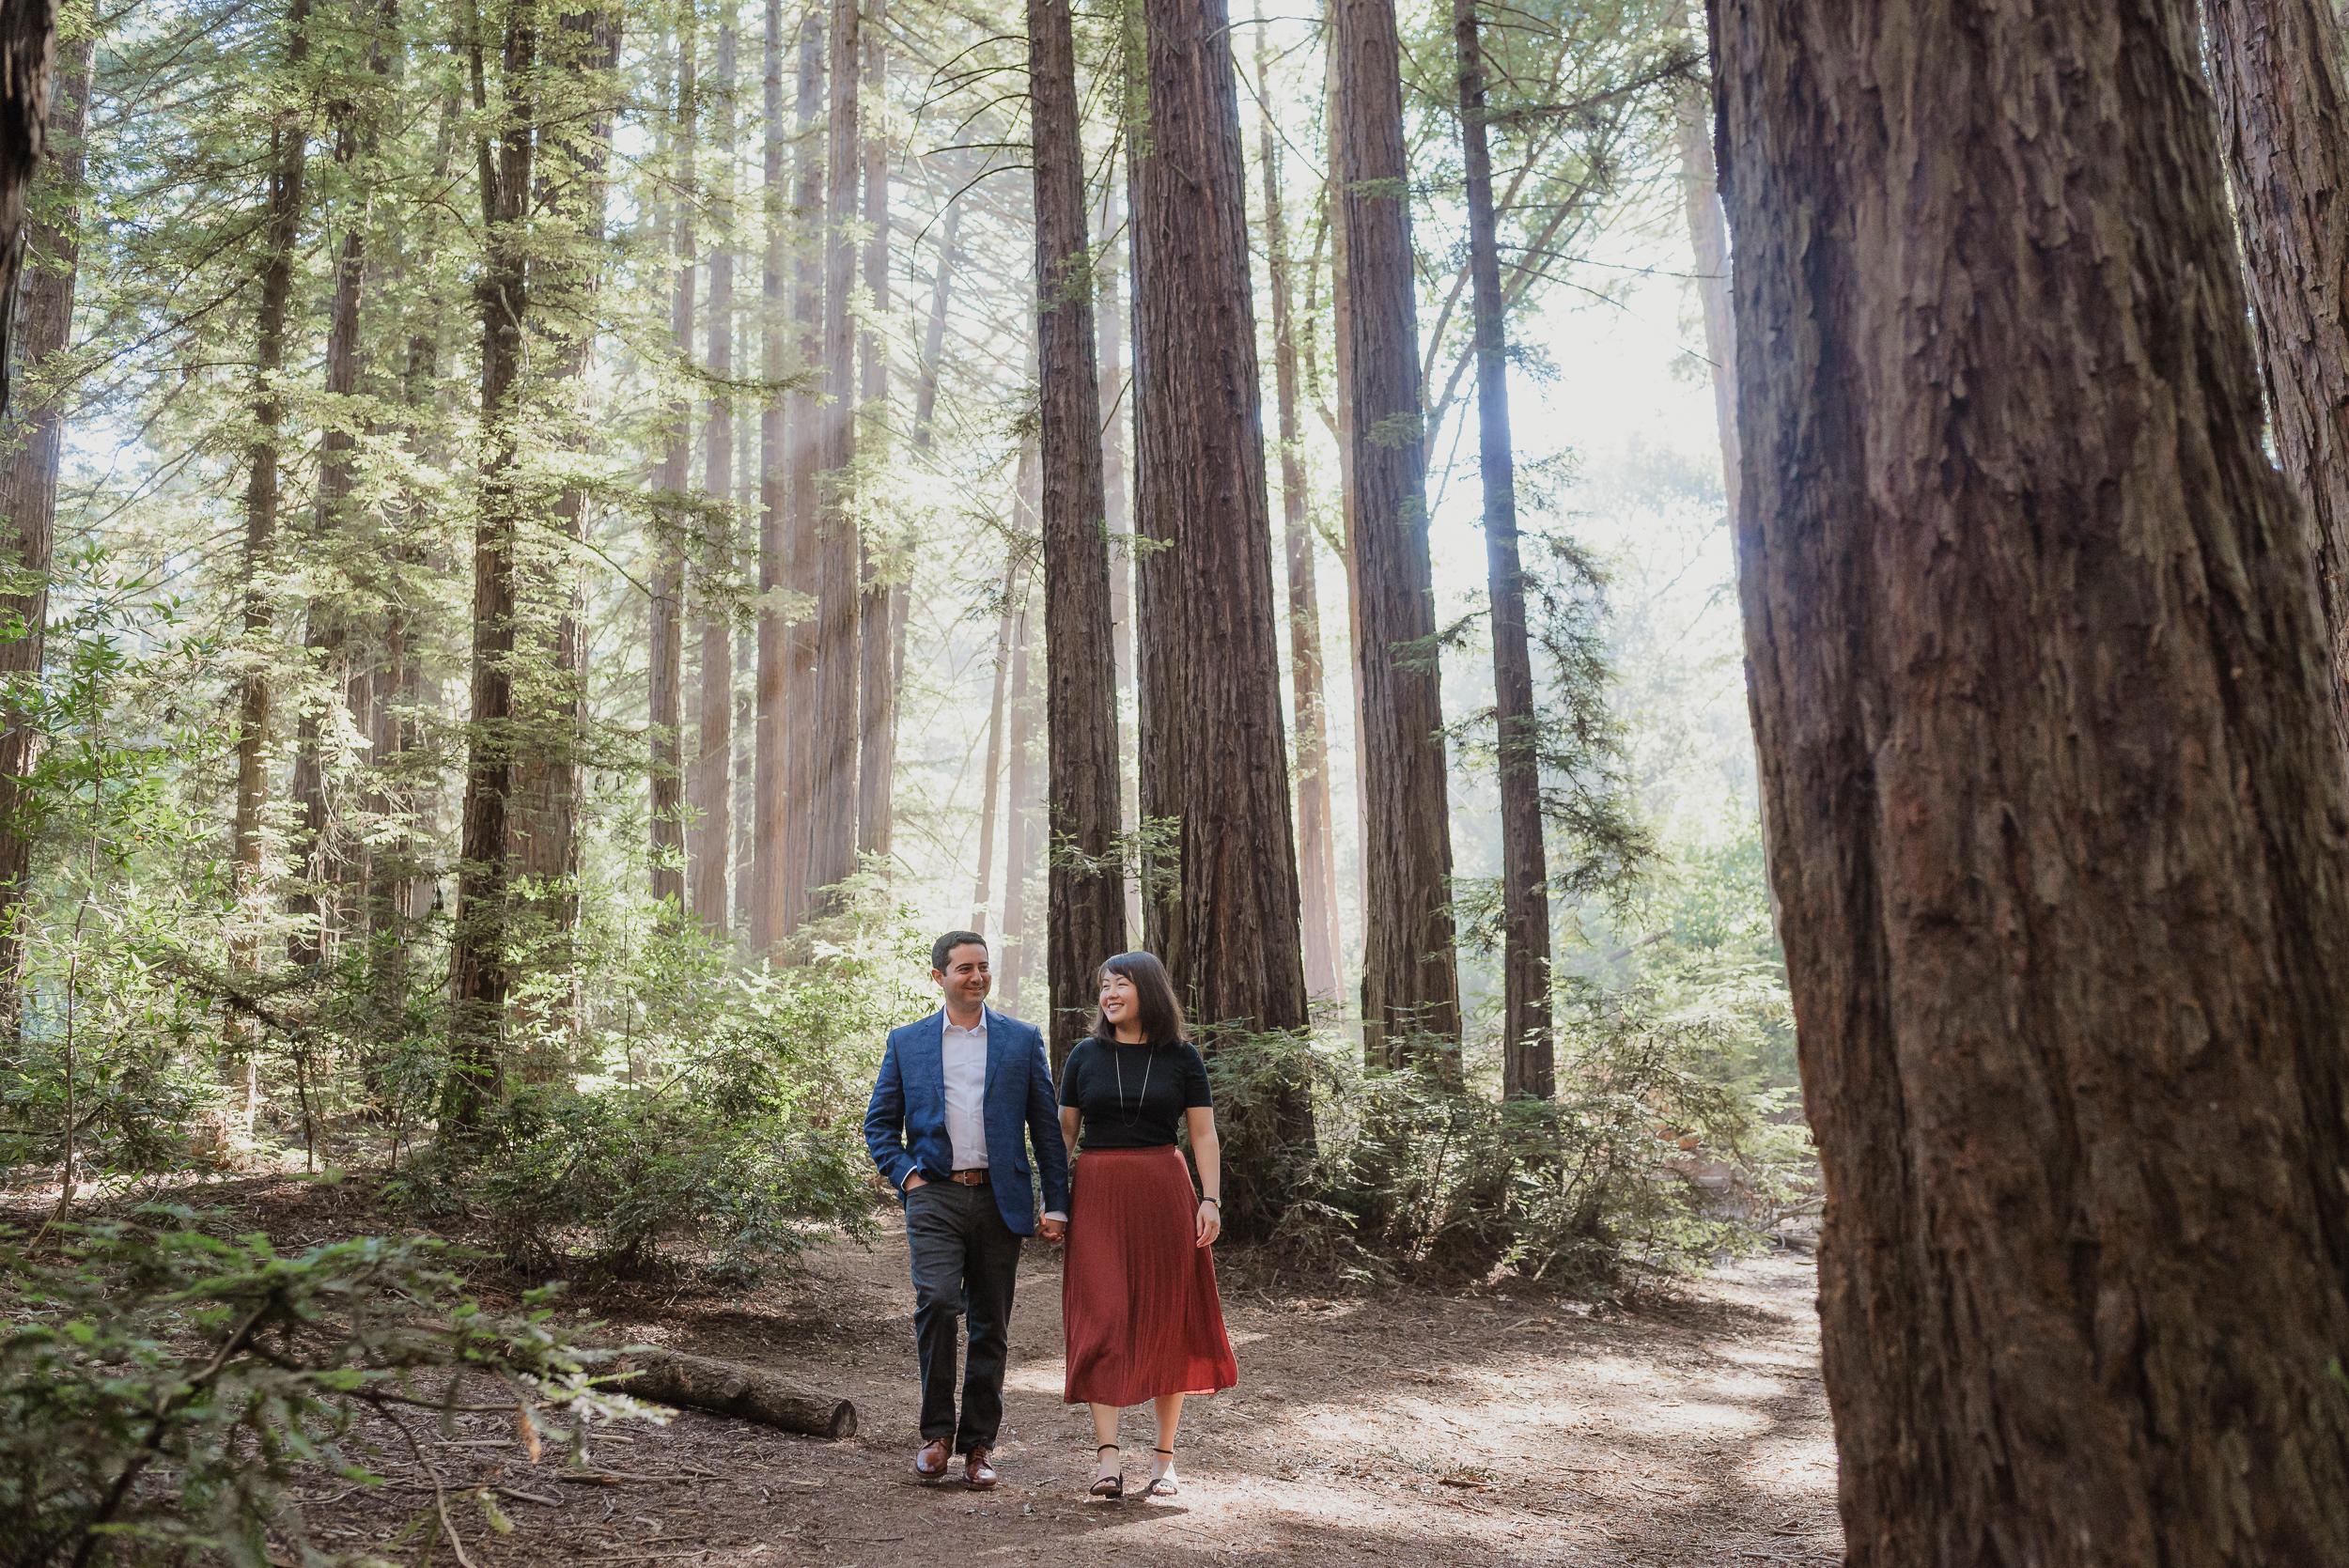 oakland-redwood-engagement-session-photographer-vivianchen-008.jpg